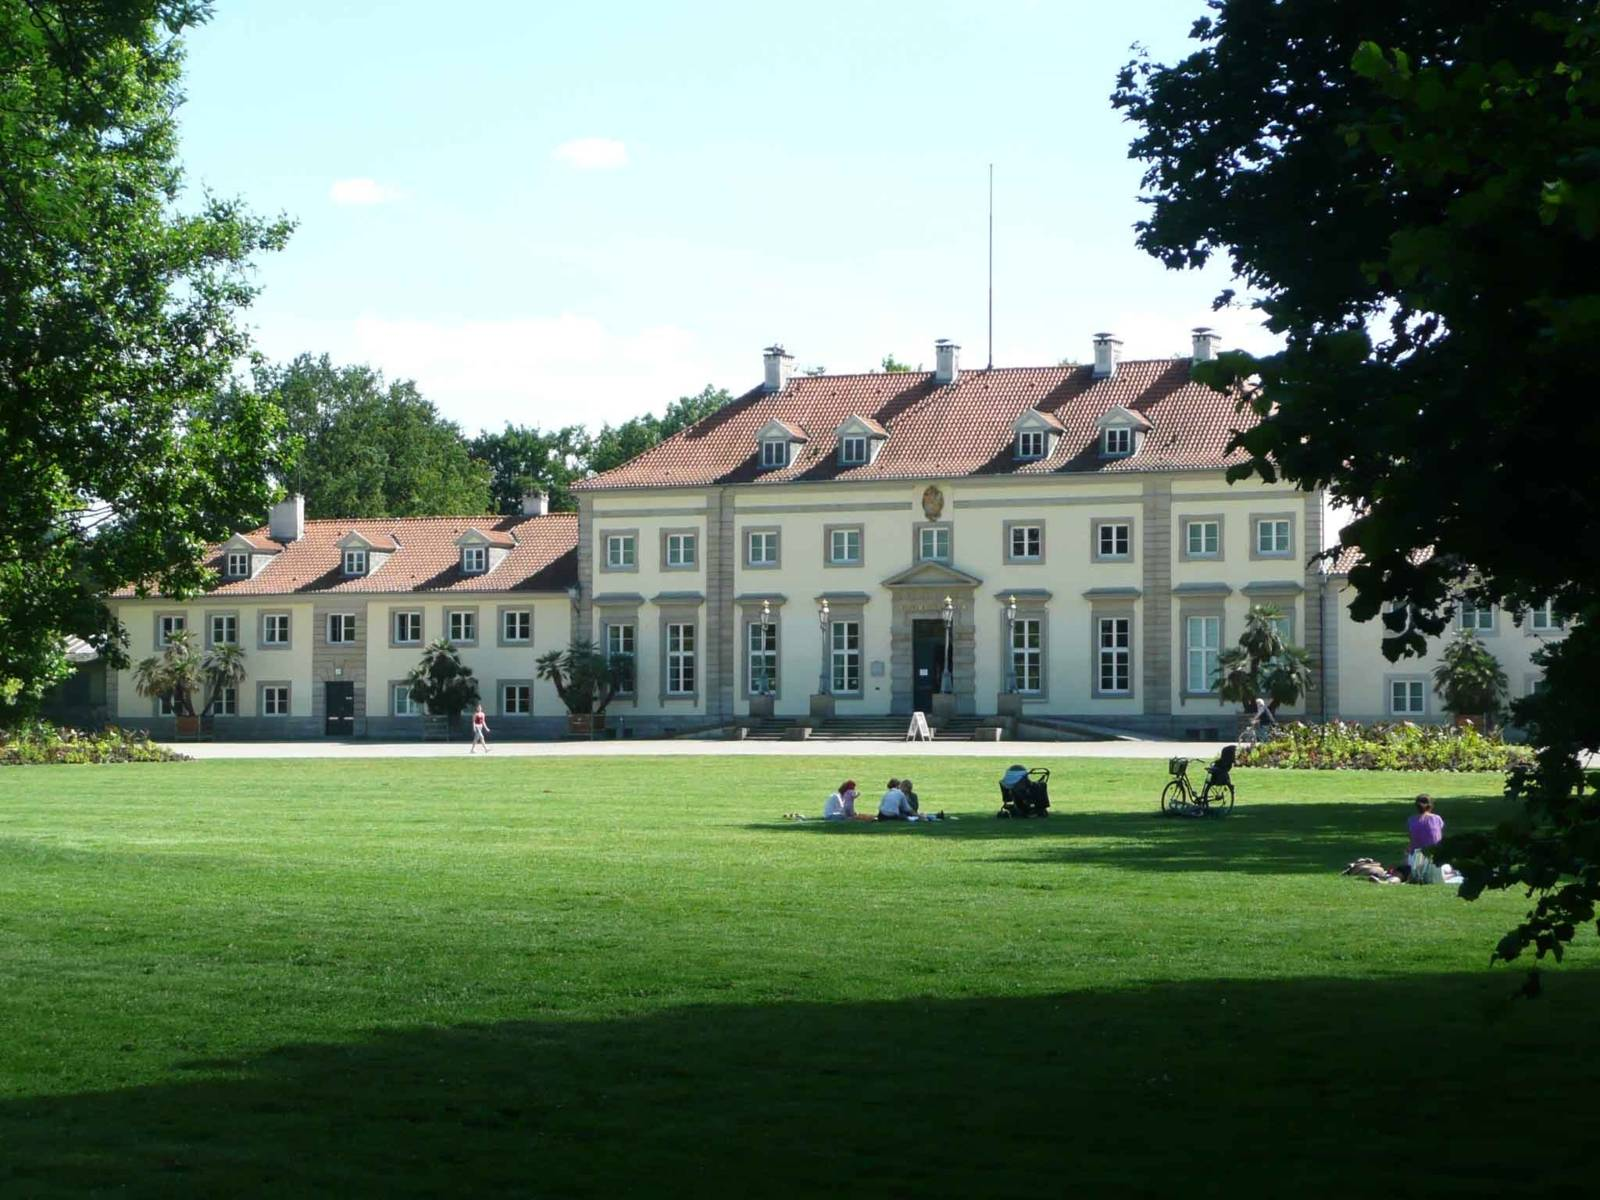 Georgenpalais